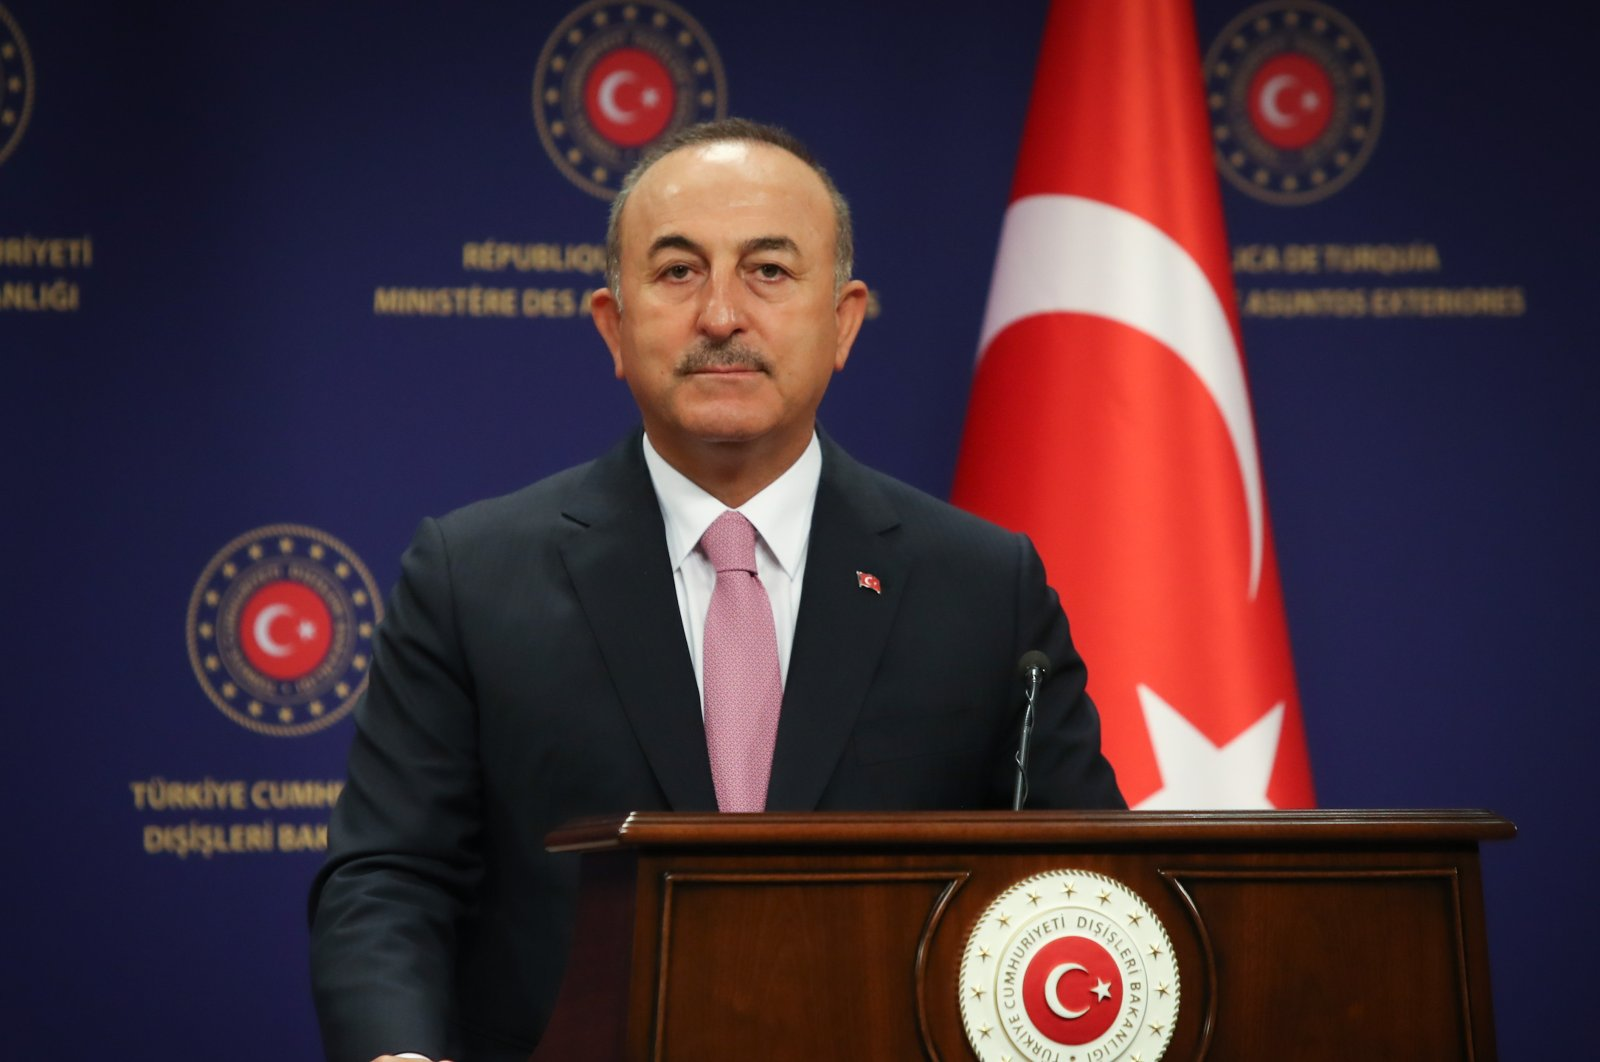 Foreign Minister Mevlüt Çavuşoğlu speaks at a joint press conference with his Algerian counterpart Sabri Boukadoum in Ankara, Turkey, Sept. 1, 2020. (AA Photo)